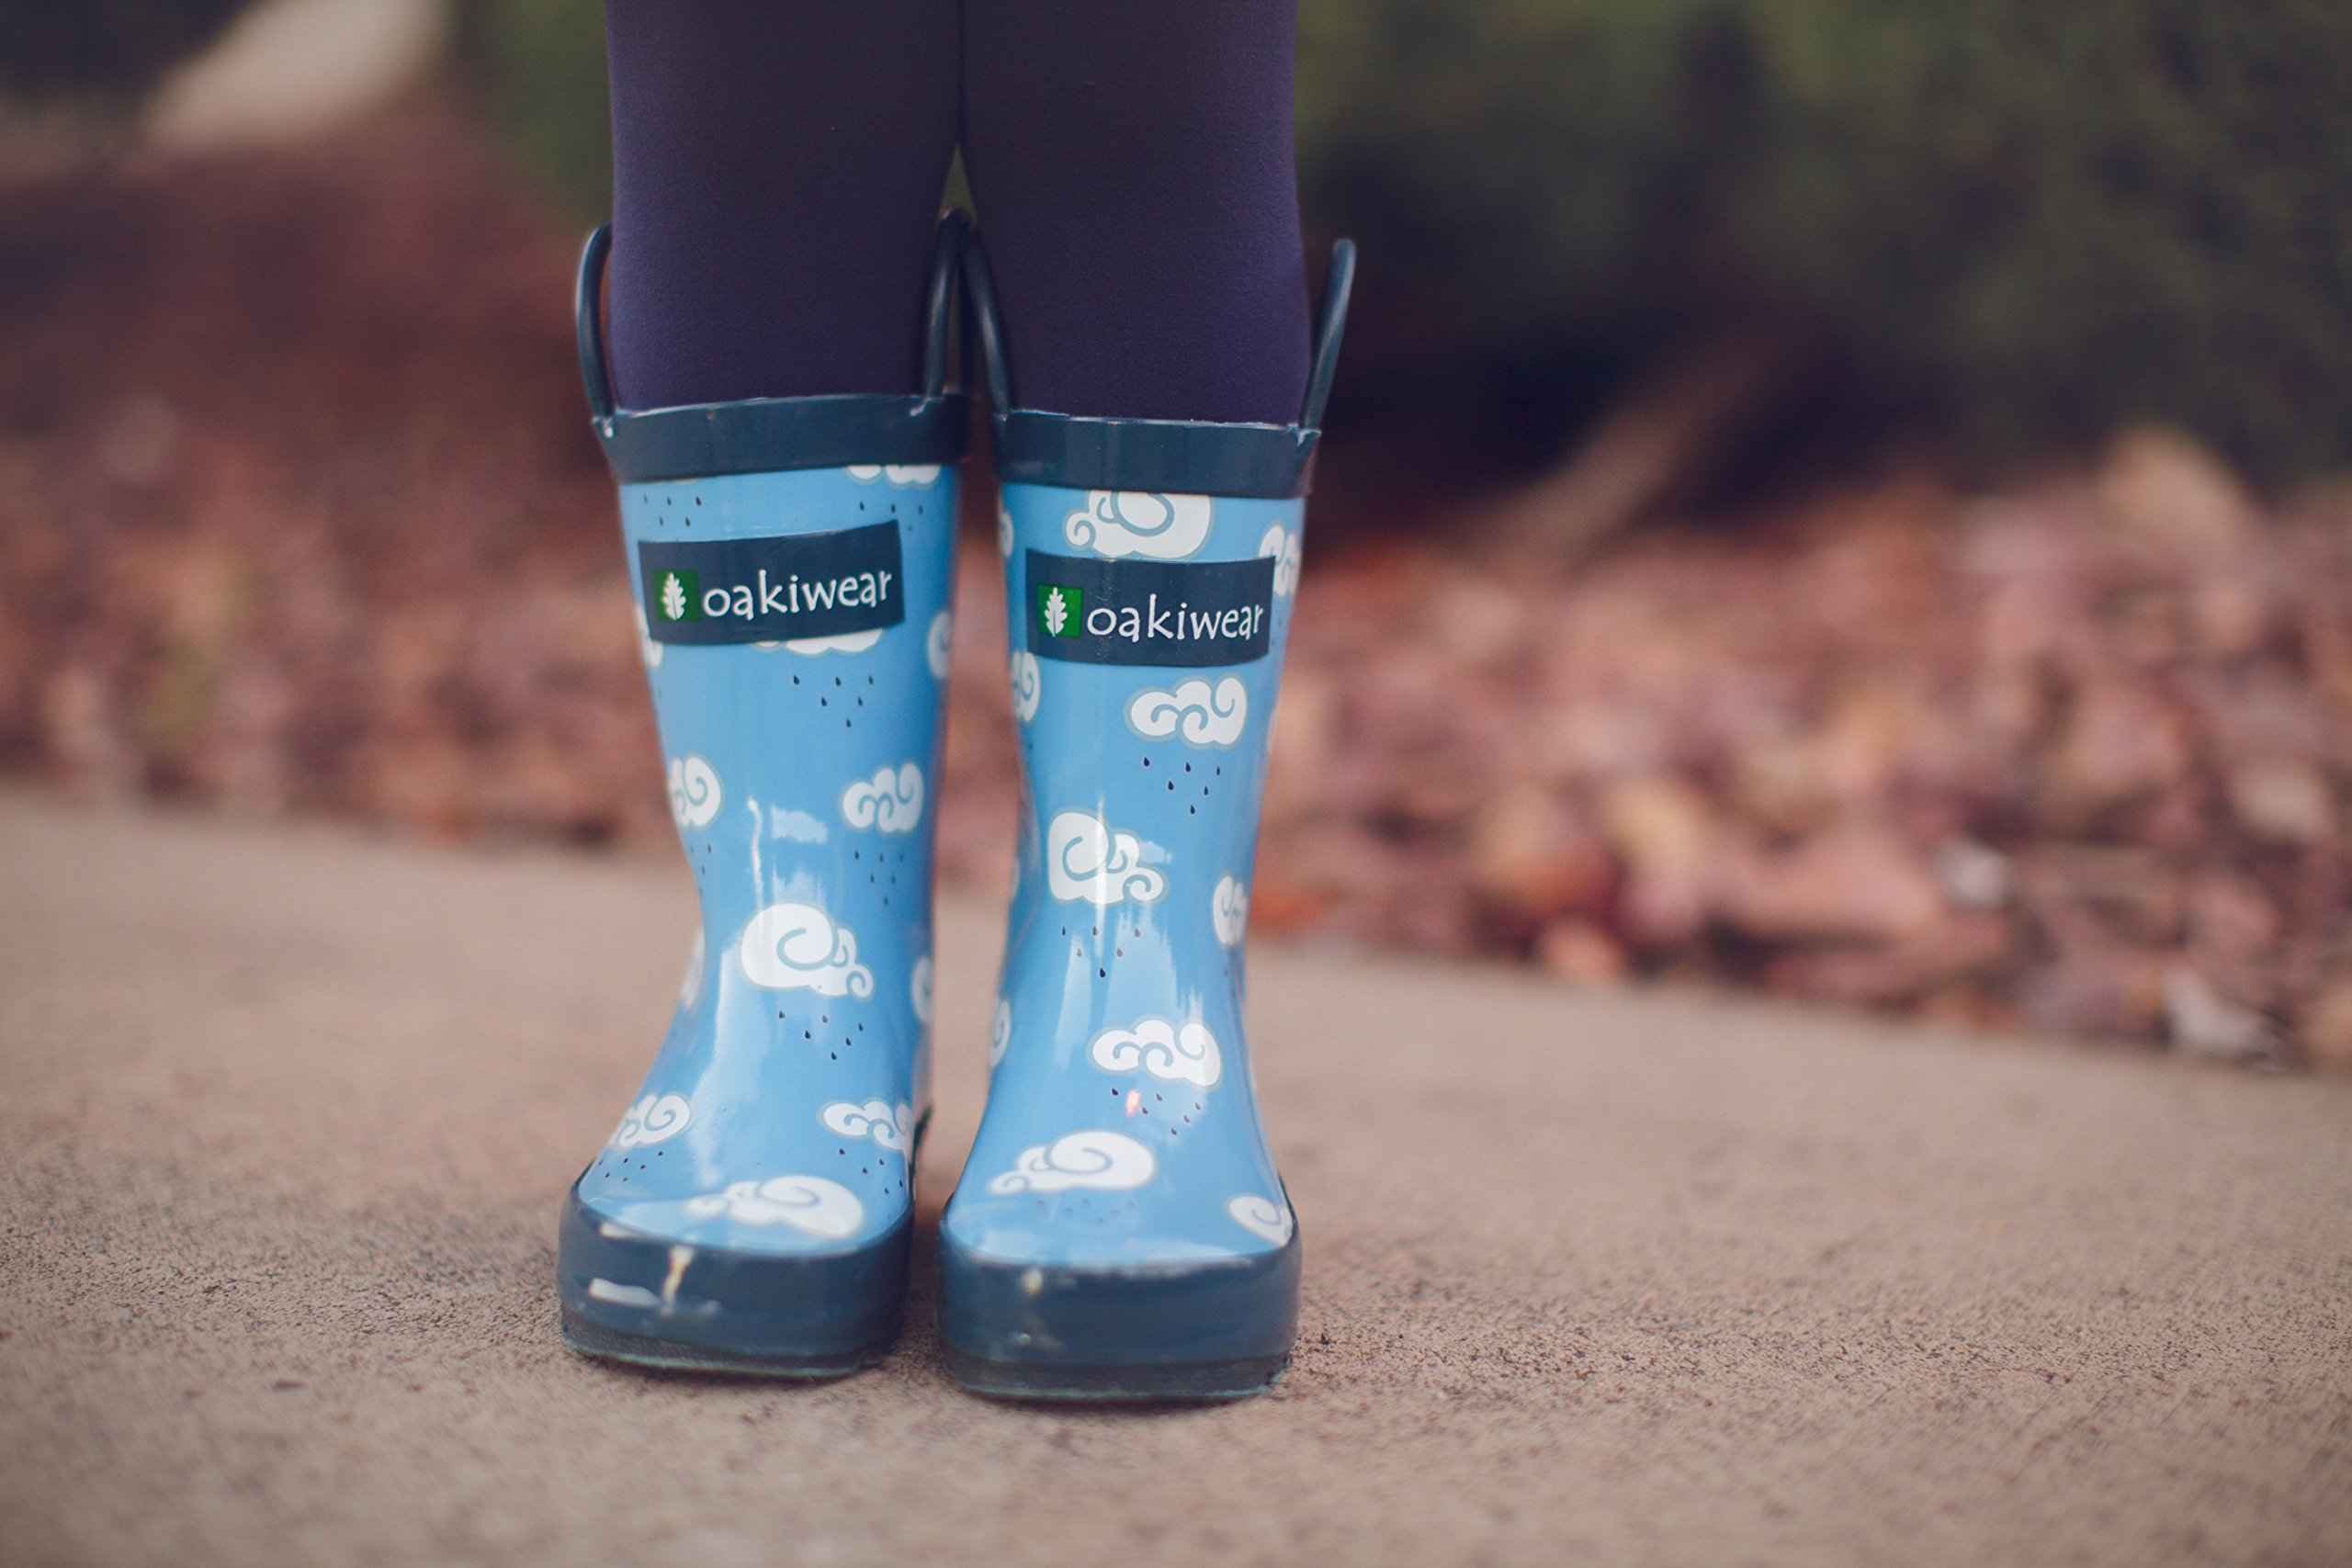 Oakiwear Kids Rubber Rain Boots with Easy-On Handles, Clouds, 9T US Toddler by Oakiwear (Image #8)